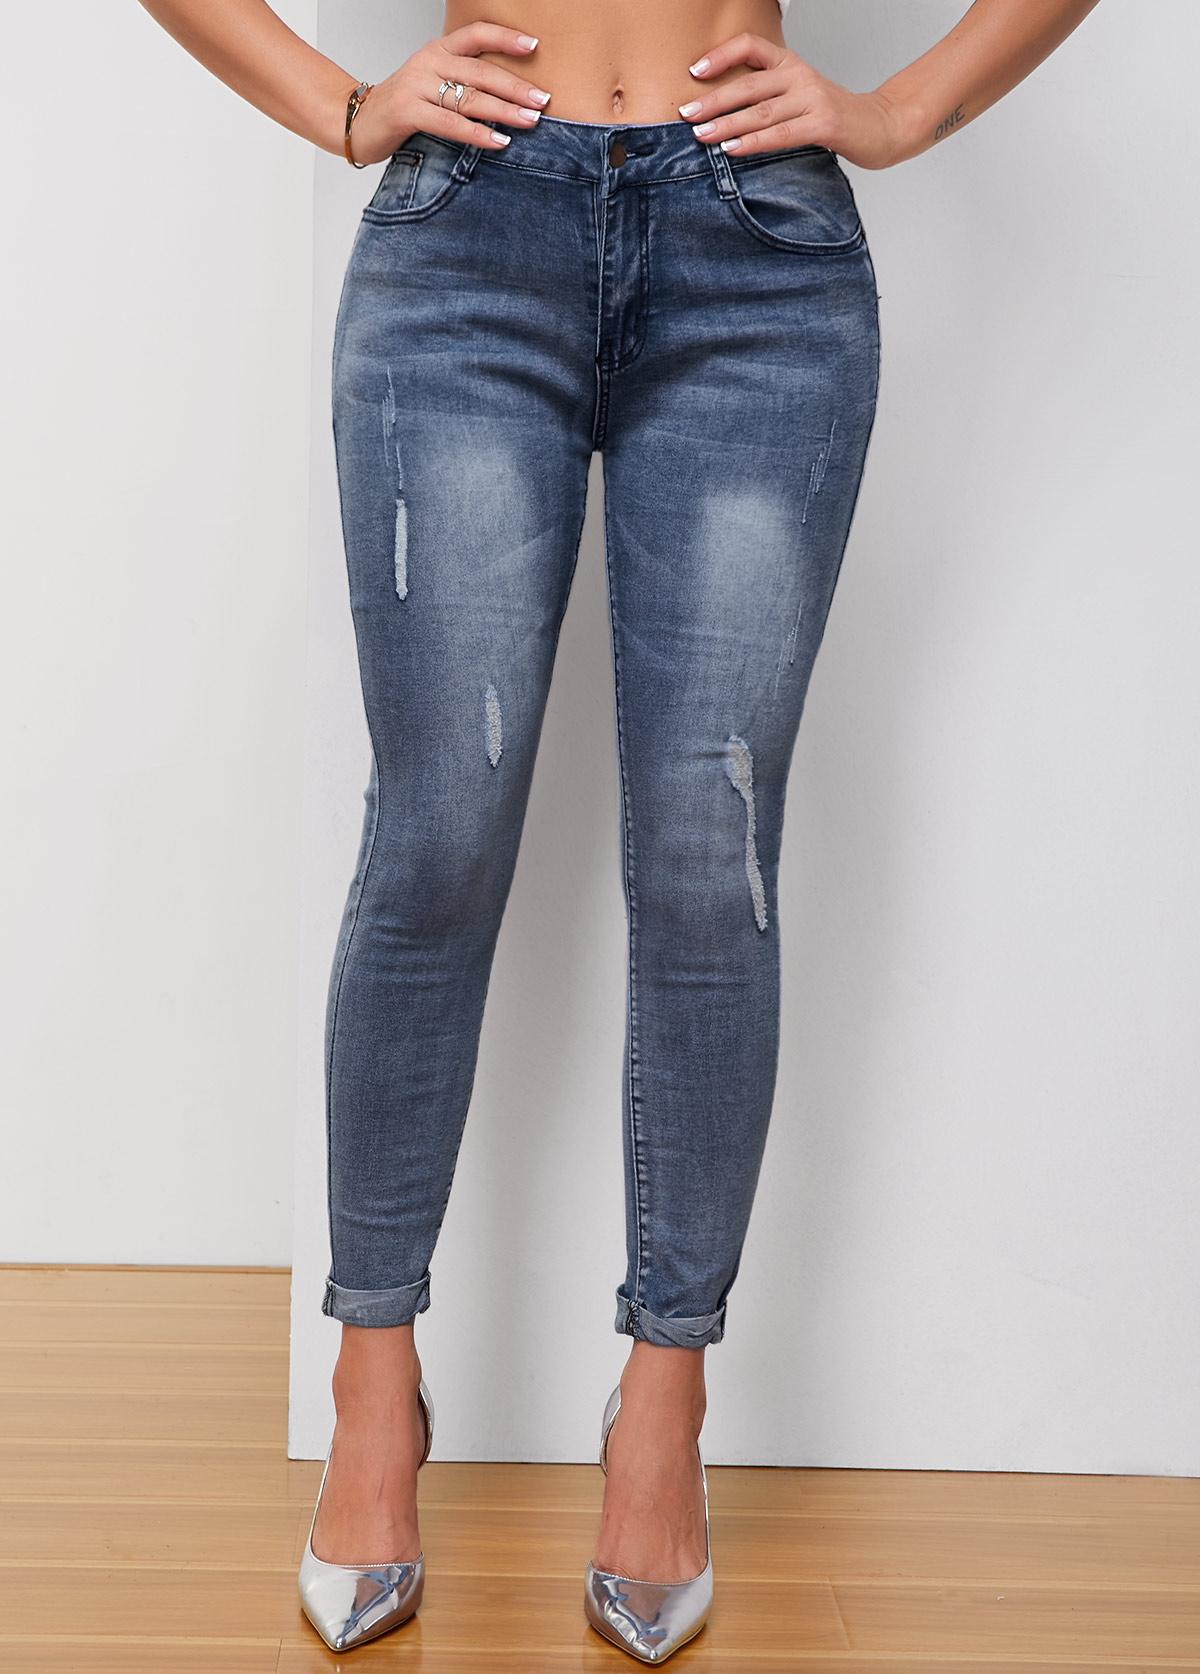 ROTITA Pocket Shredded Acid Washed Skinny Jeans